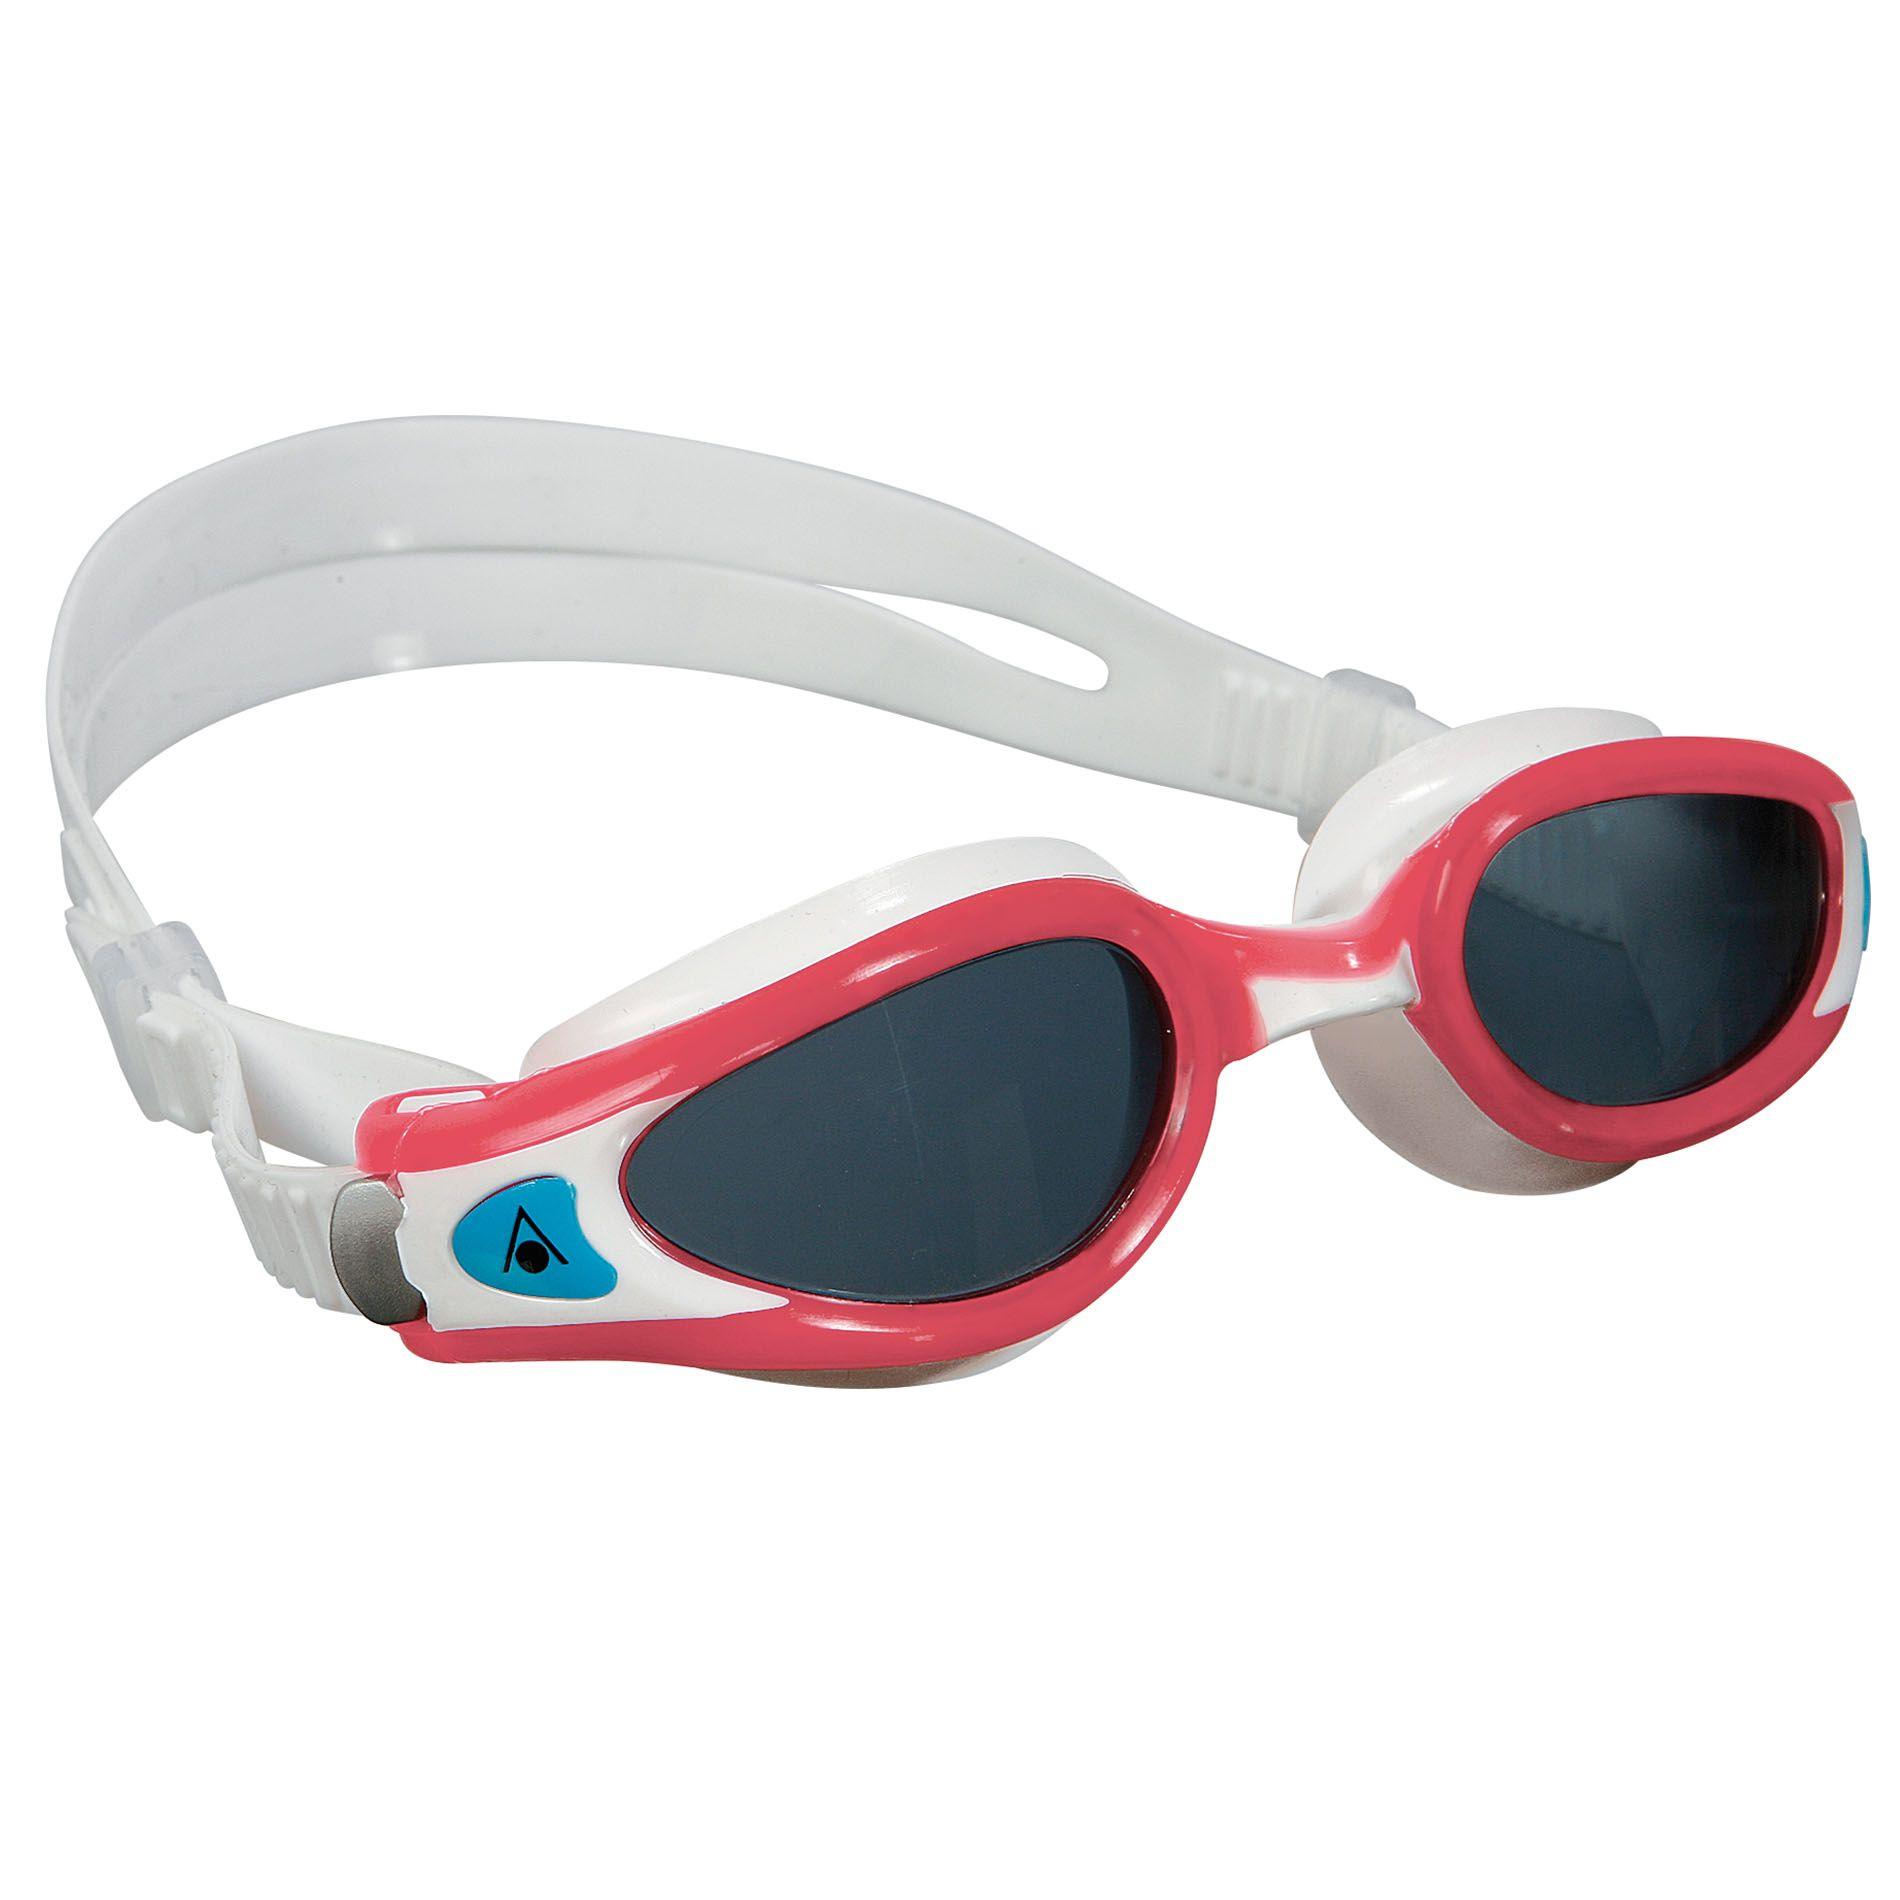 Aqua Sphere Kaiman Exo Ladies Swimming Goggles Tinted